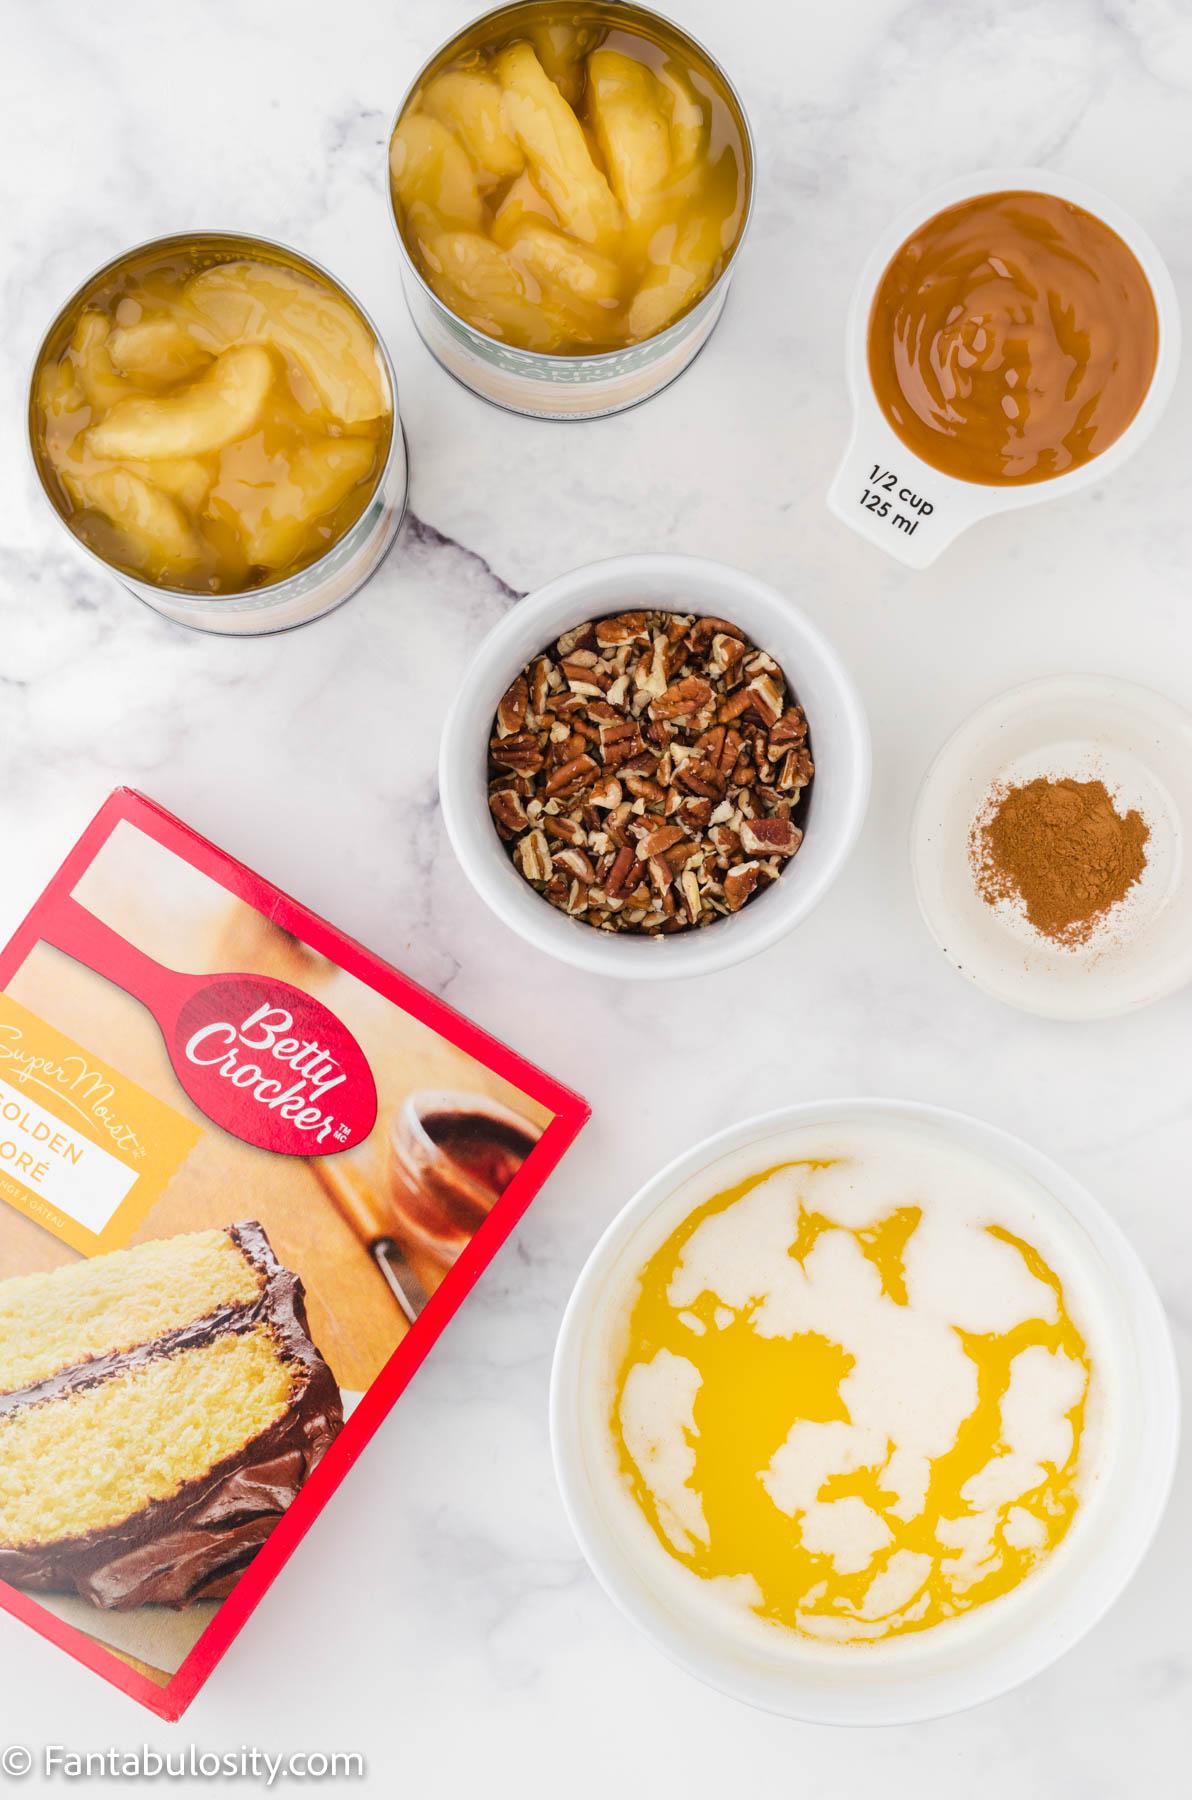 Ingredients for caramel apple dump cake